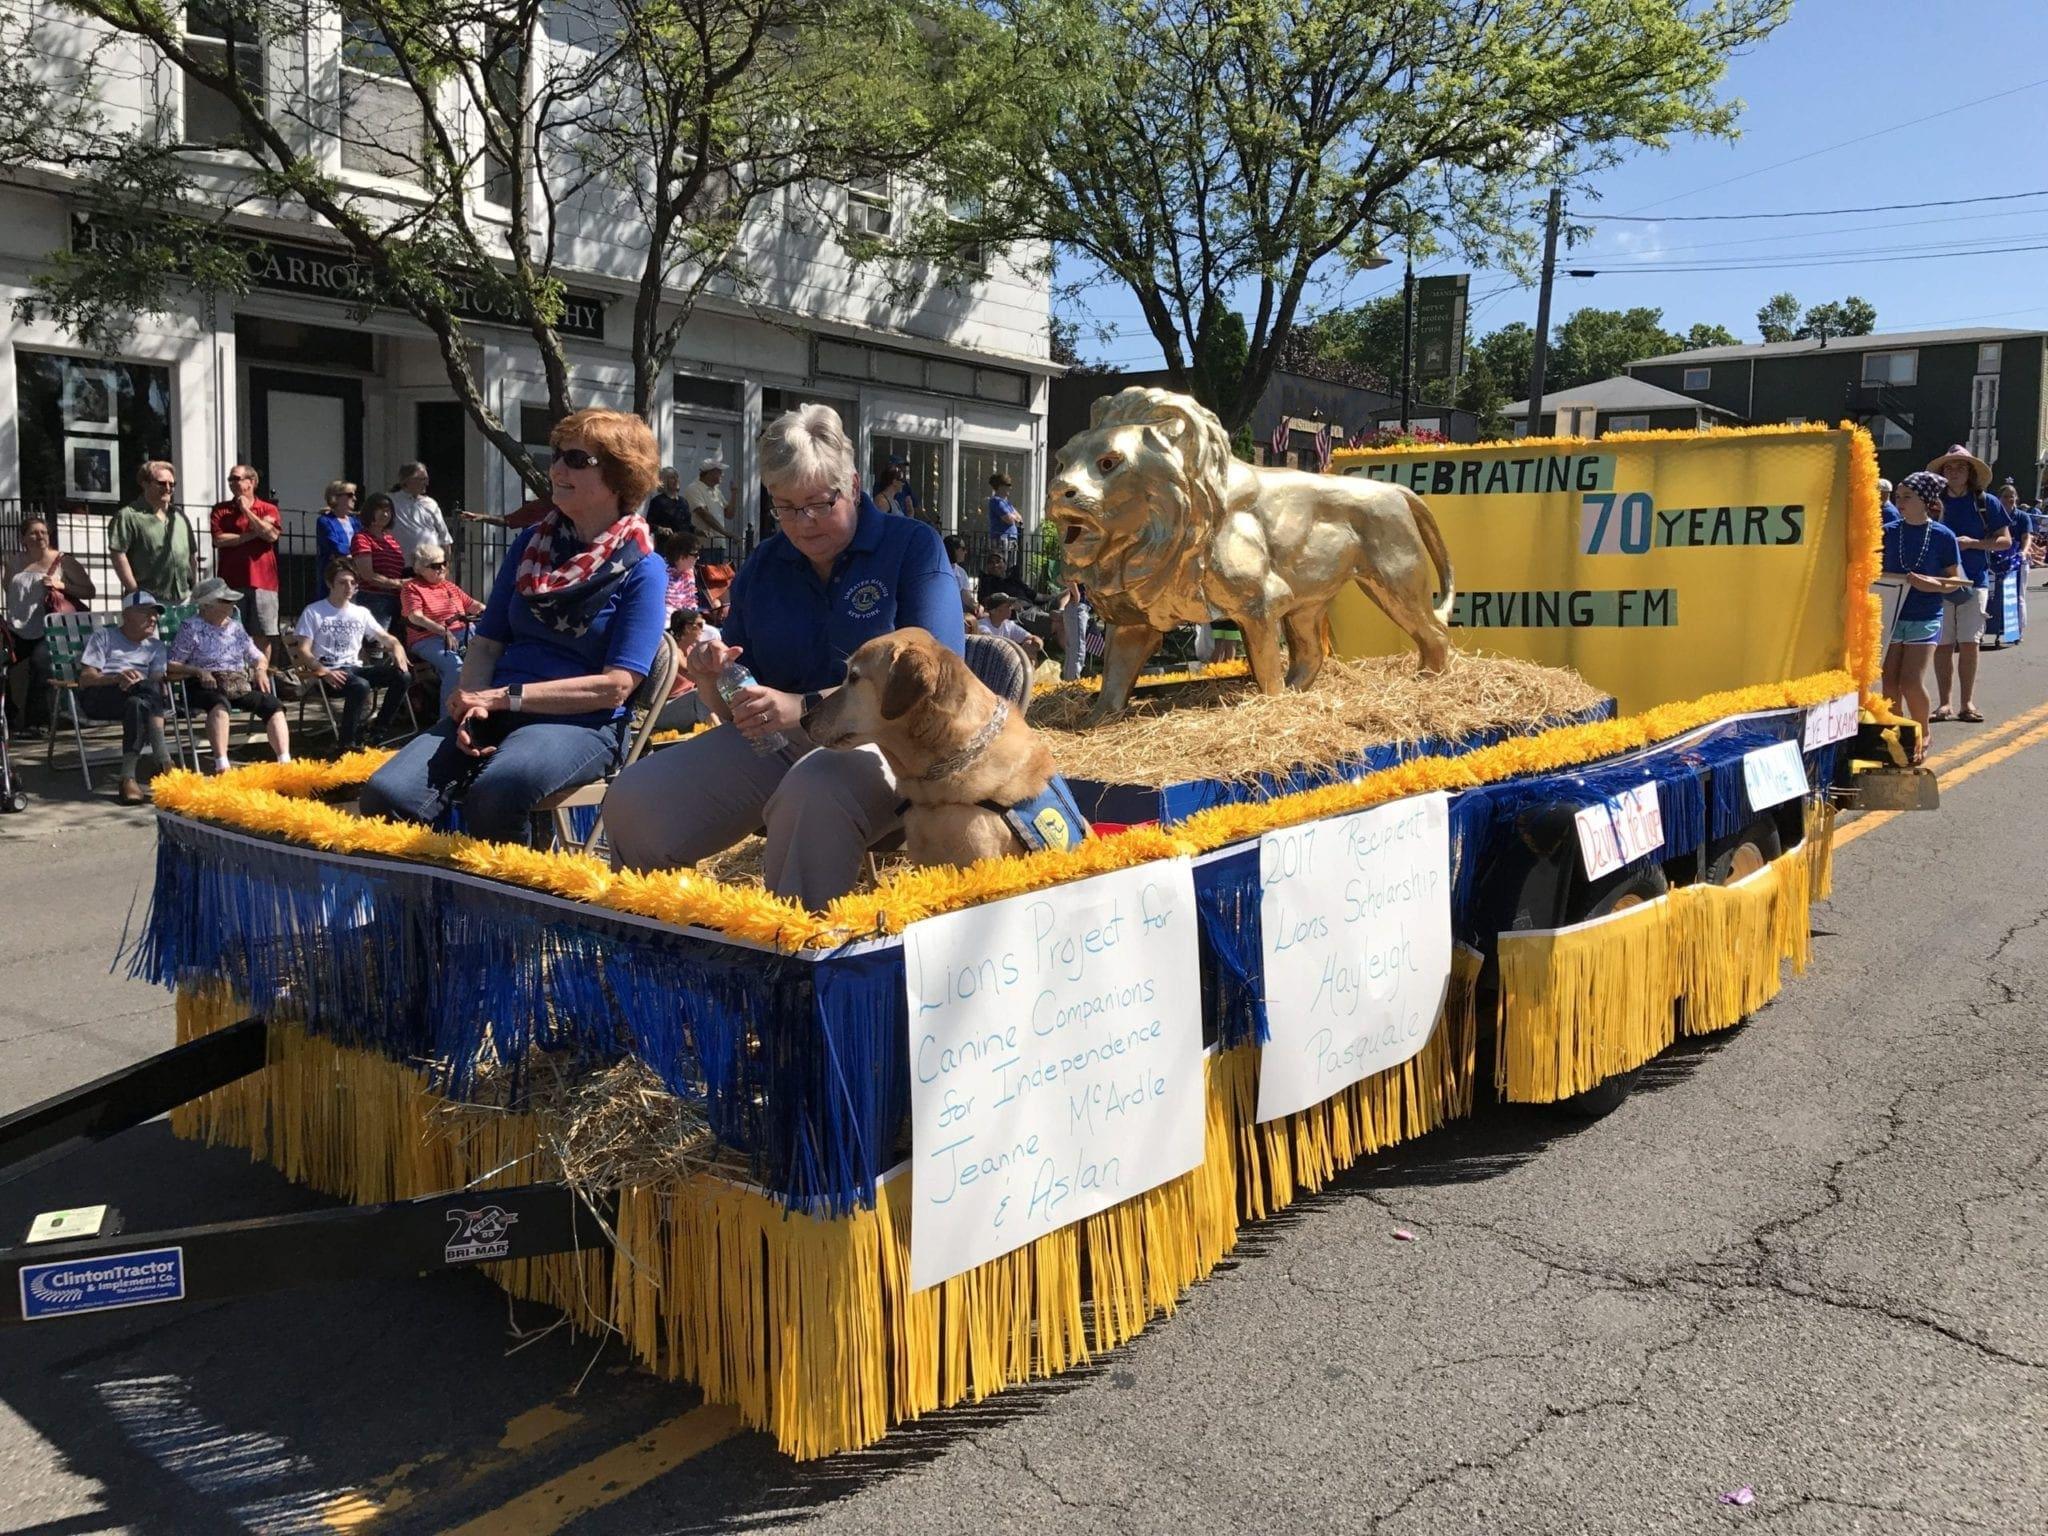 Manlius Lions Club to celebrate 70th anniversary